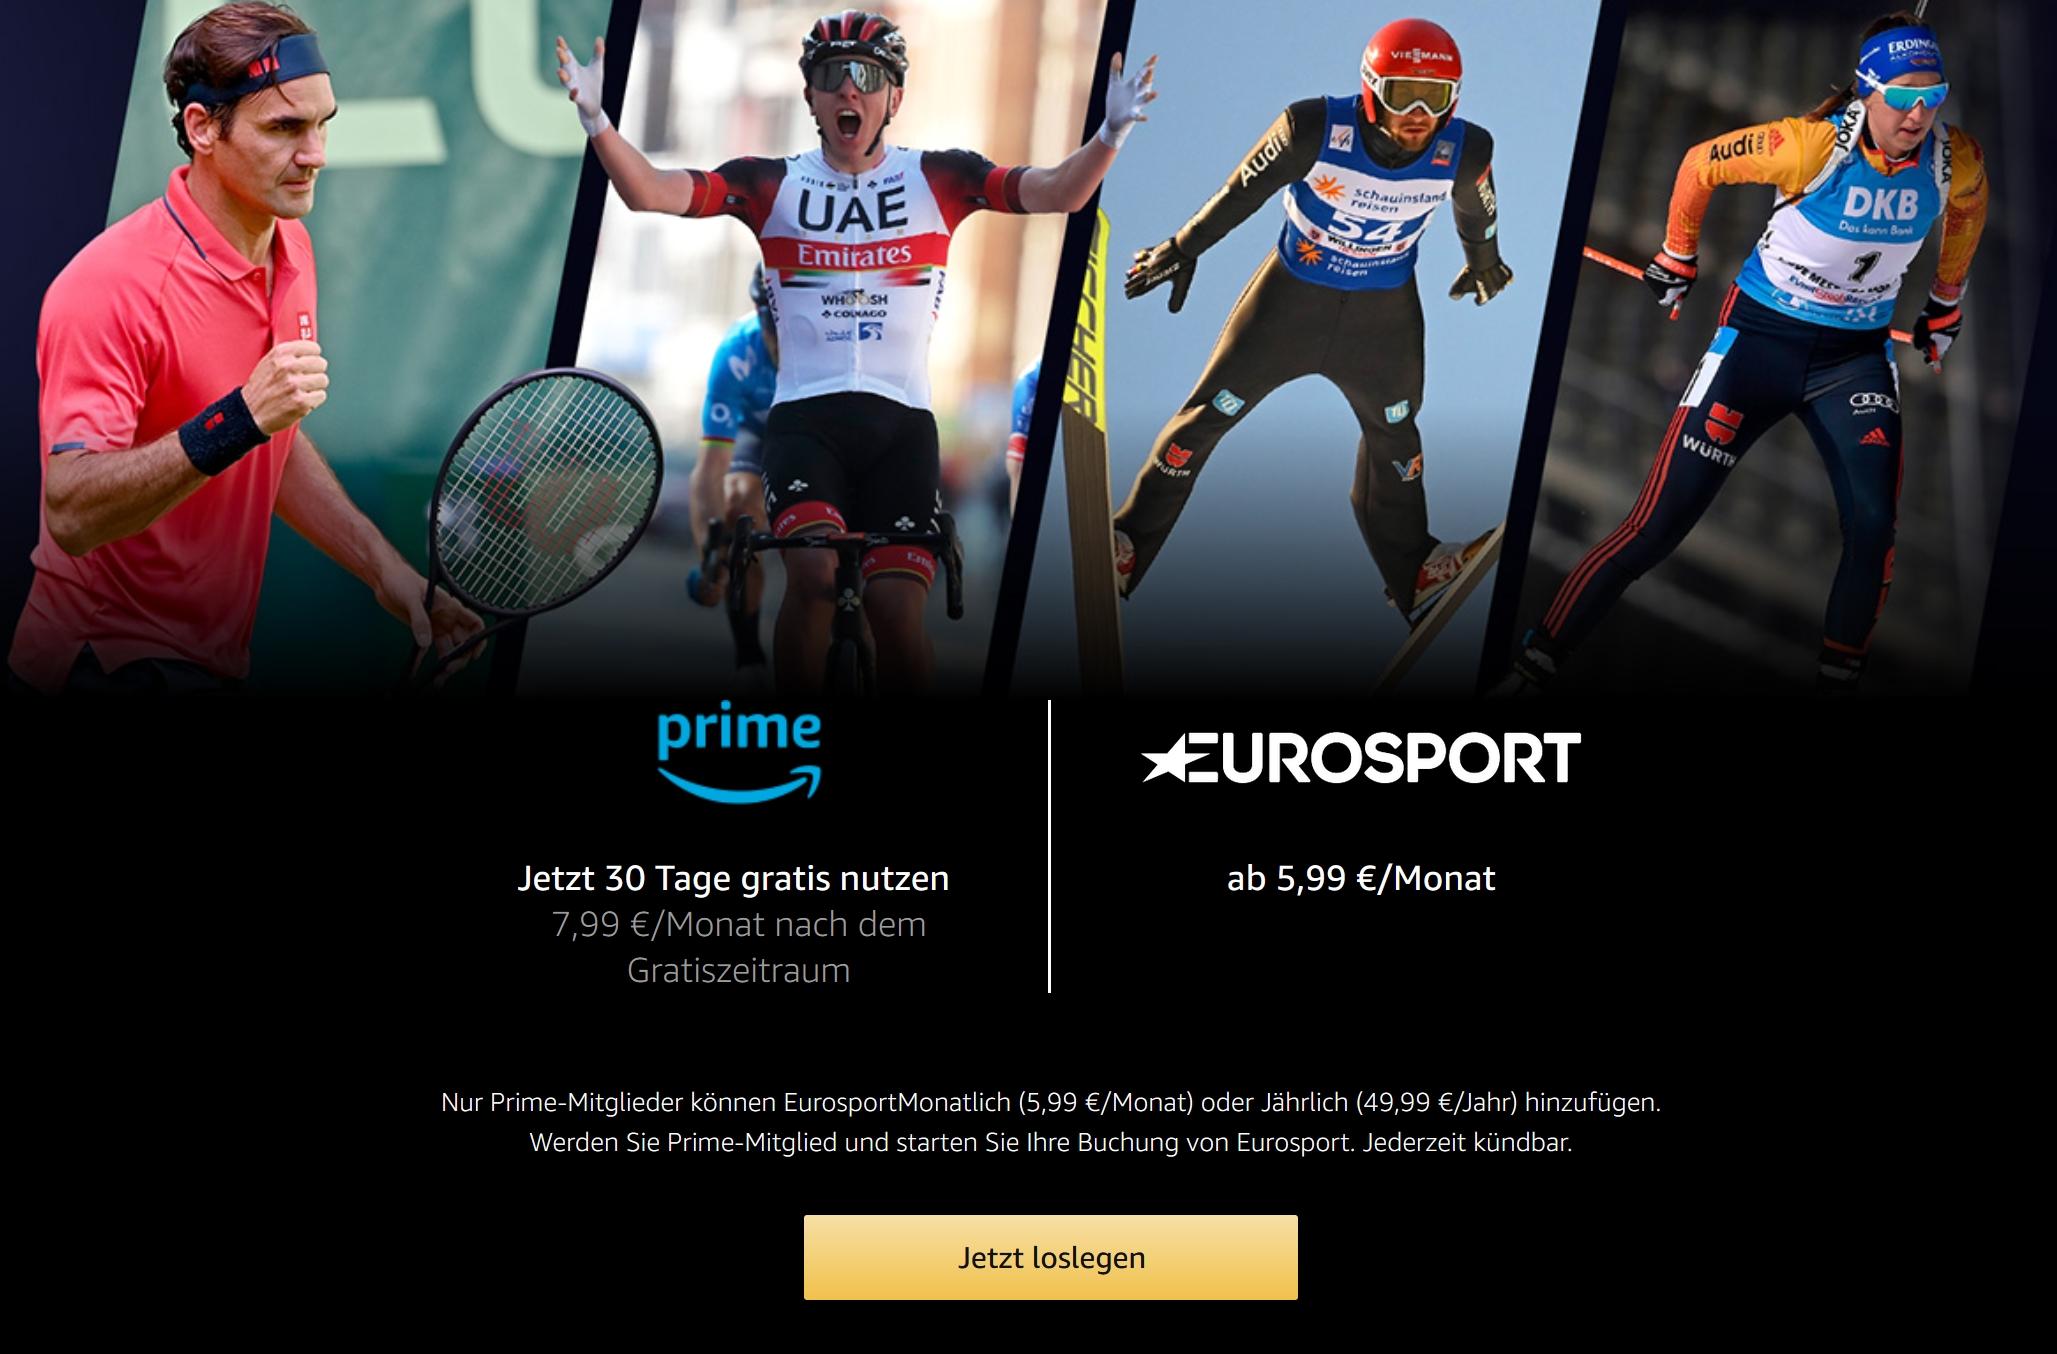 prime-video-sport-angebot-2021